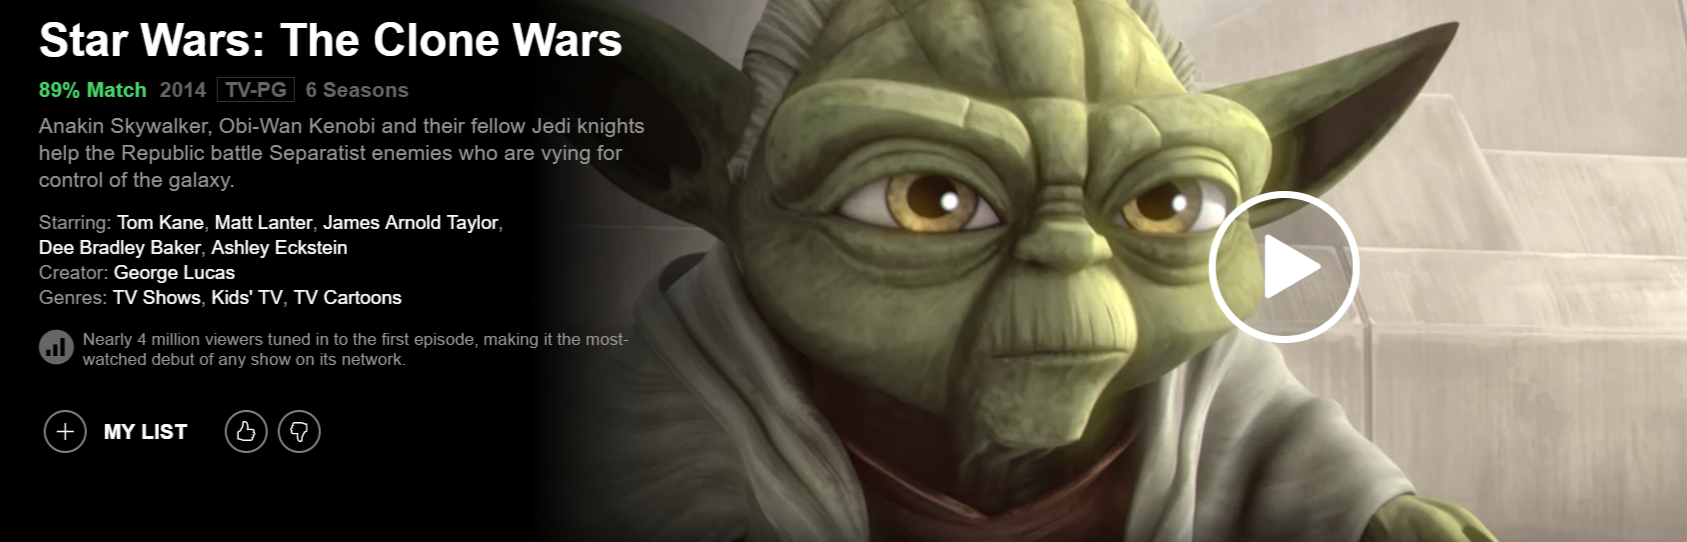 Netflix Spinner New Fantasy Sci Fi Show Binge Watch Star Wars Clone